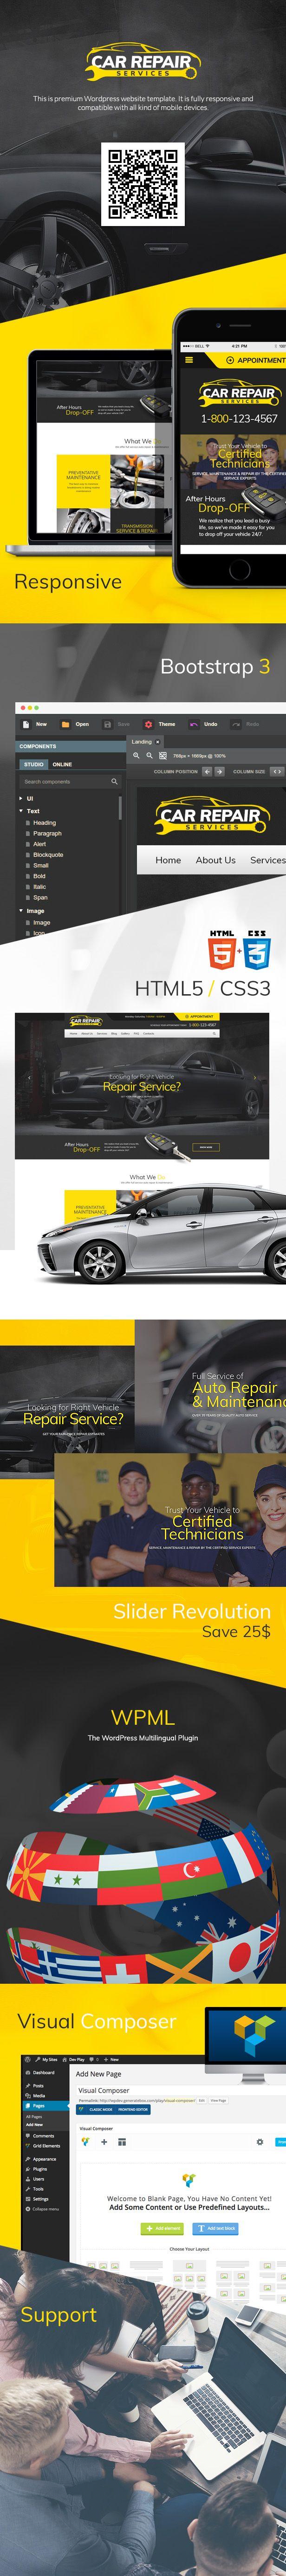 Car Repair Services Auto Mechanic Wordpress Theme Mechanic Workshops Download Https Themeforest Net Item C Car Repair Service Car Mechanic Auto Repair